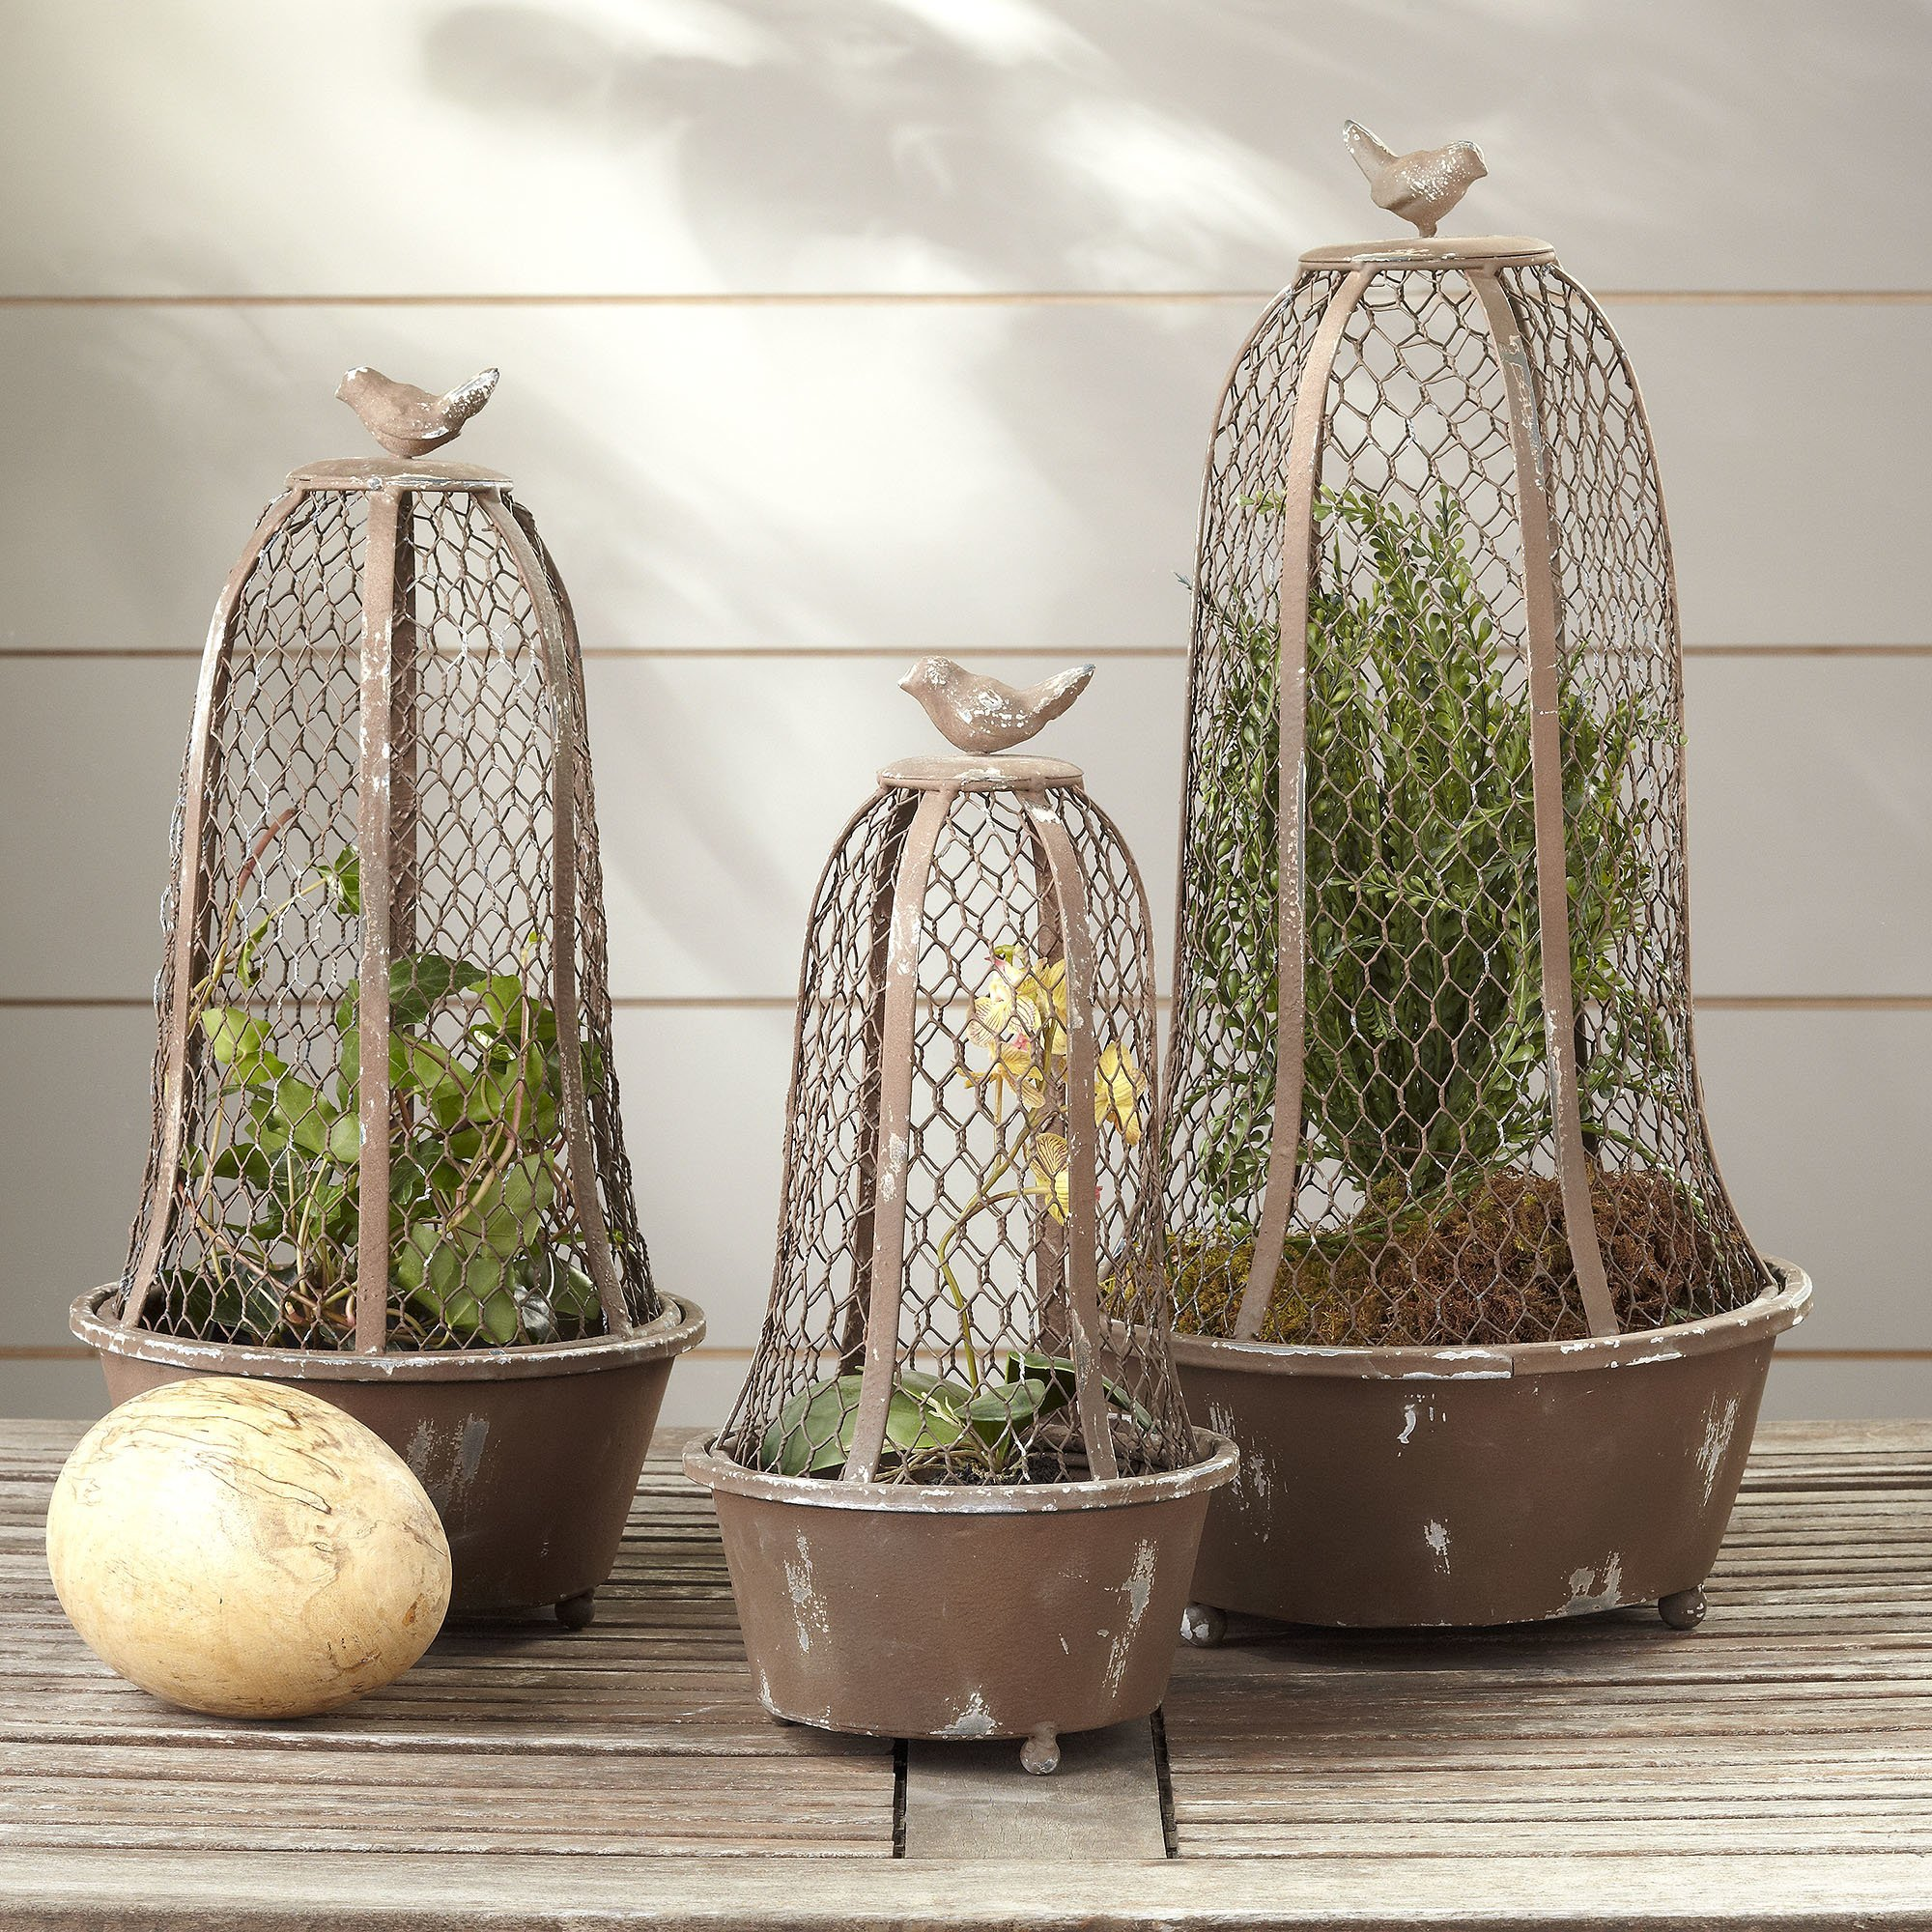 3 Piece Perch Wire Cloche Indoor Outdoor Terrarium Planter Set